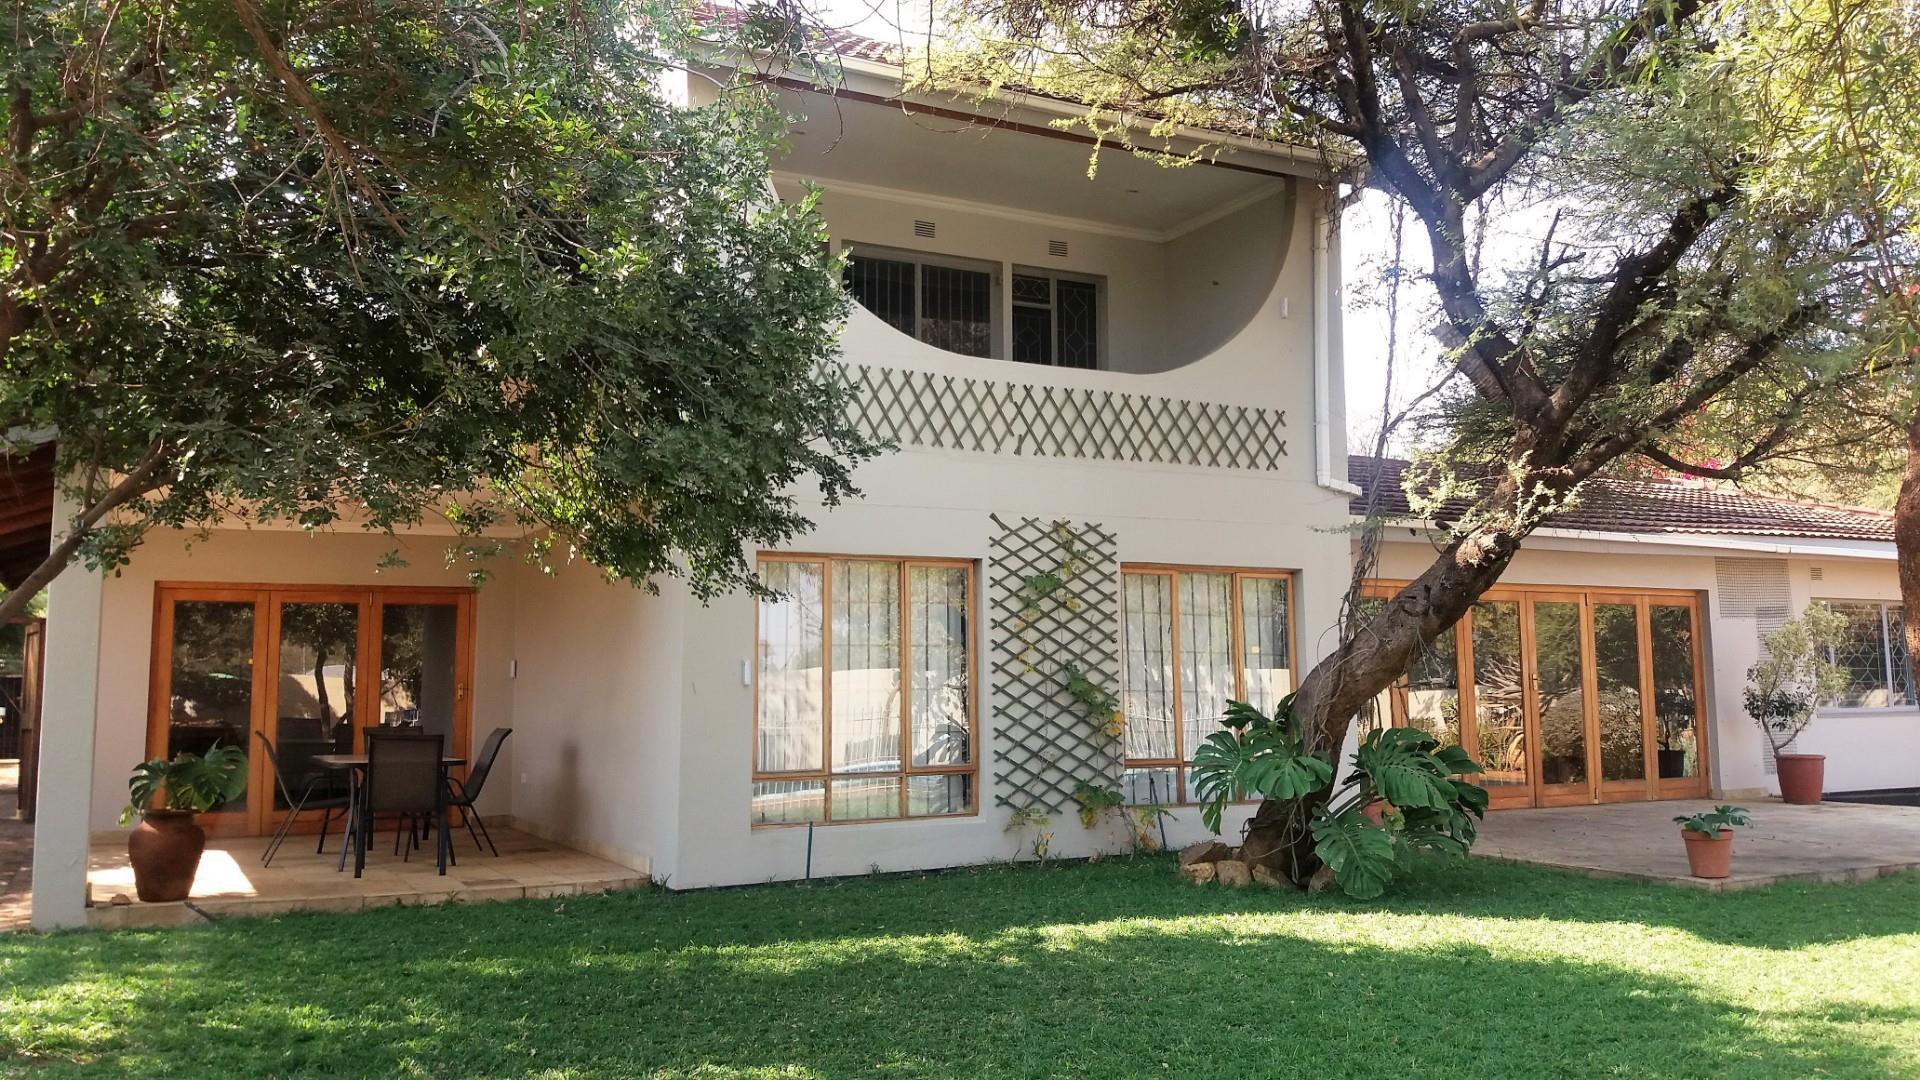 4 Bedroom House For Sale in Broadhurst